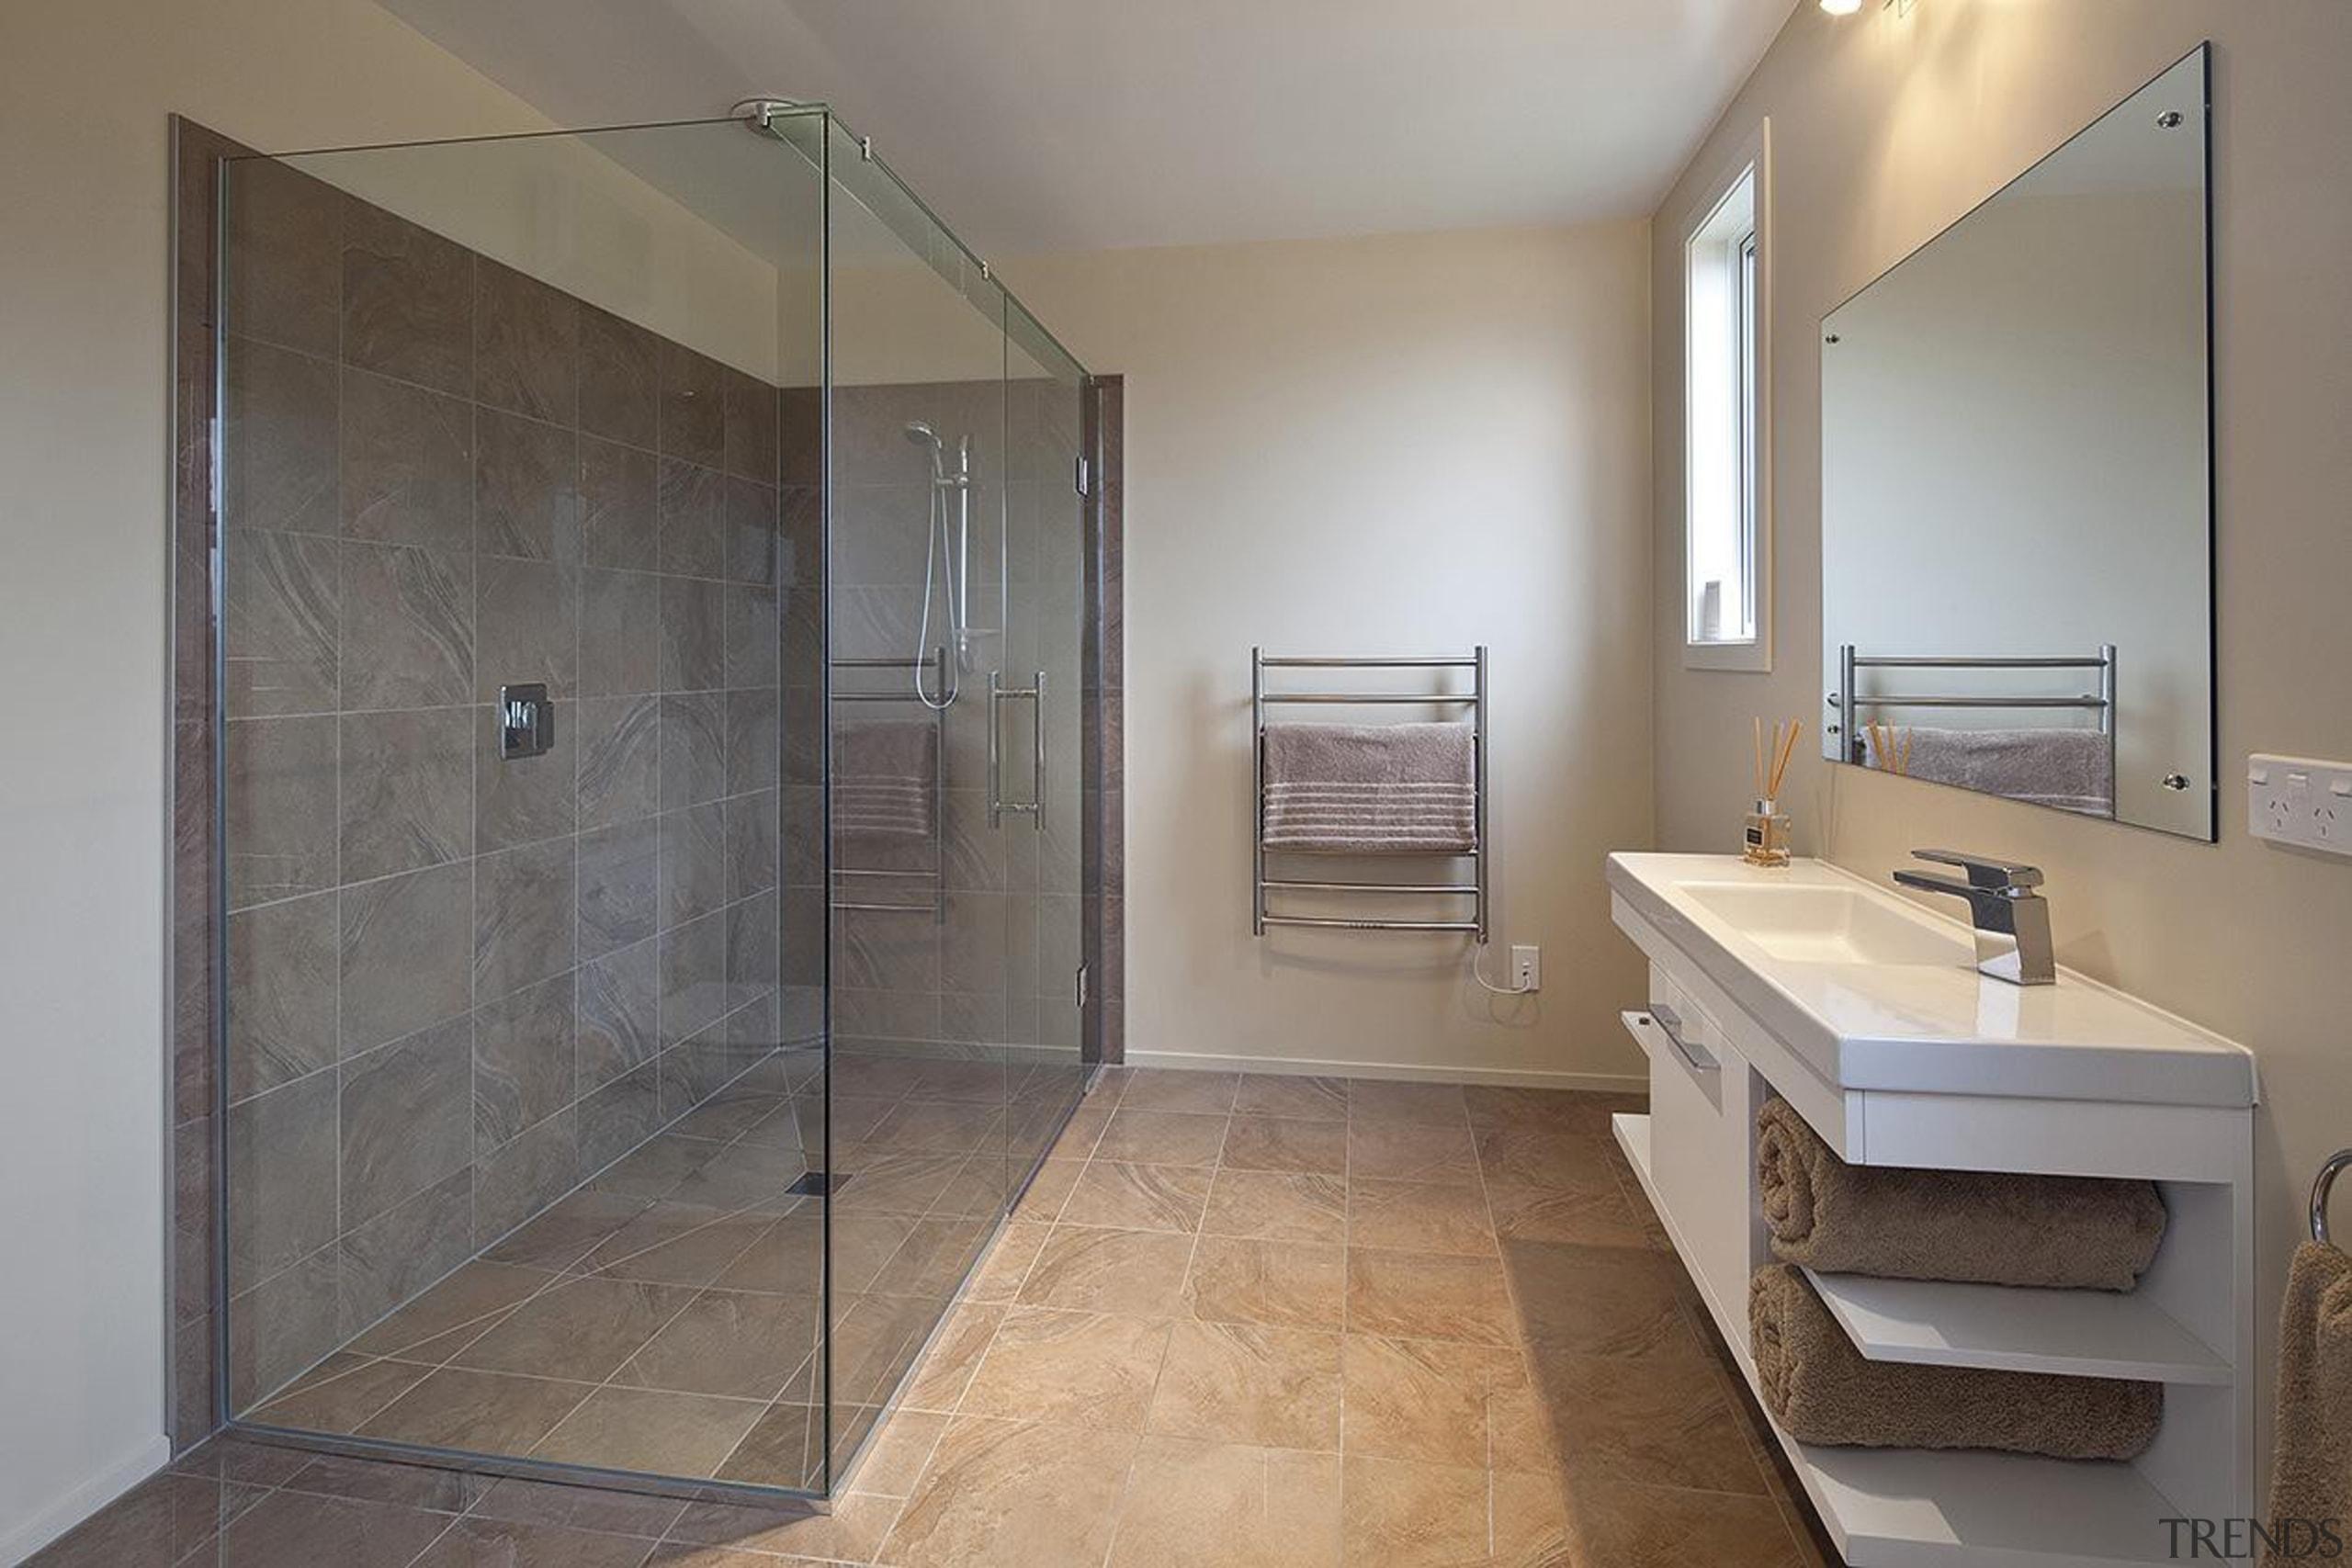 For more information, please visit www.gjgardner.co.nz architecture, bathroom, floor, home, interior design, property, real estate, room, tile, gray